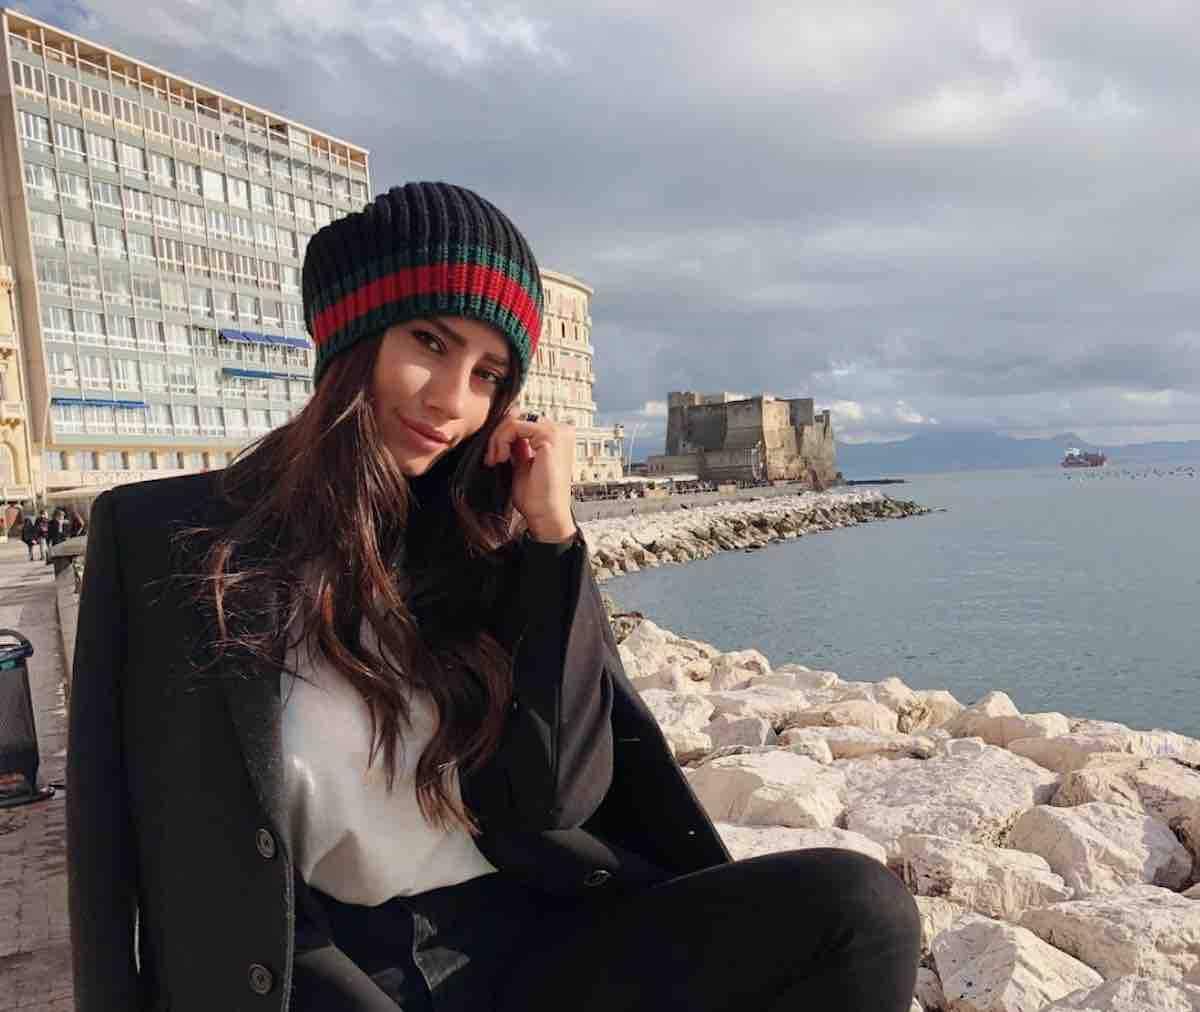 Angela Nasti chi  Et altezza carriera vita privata e Instagram